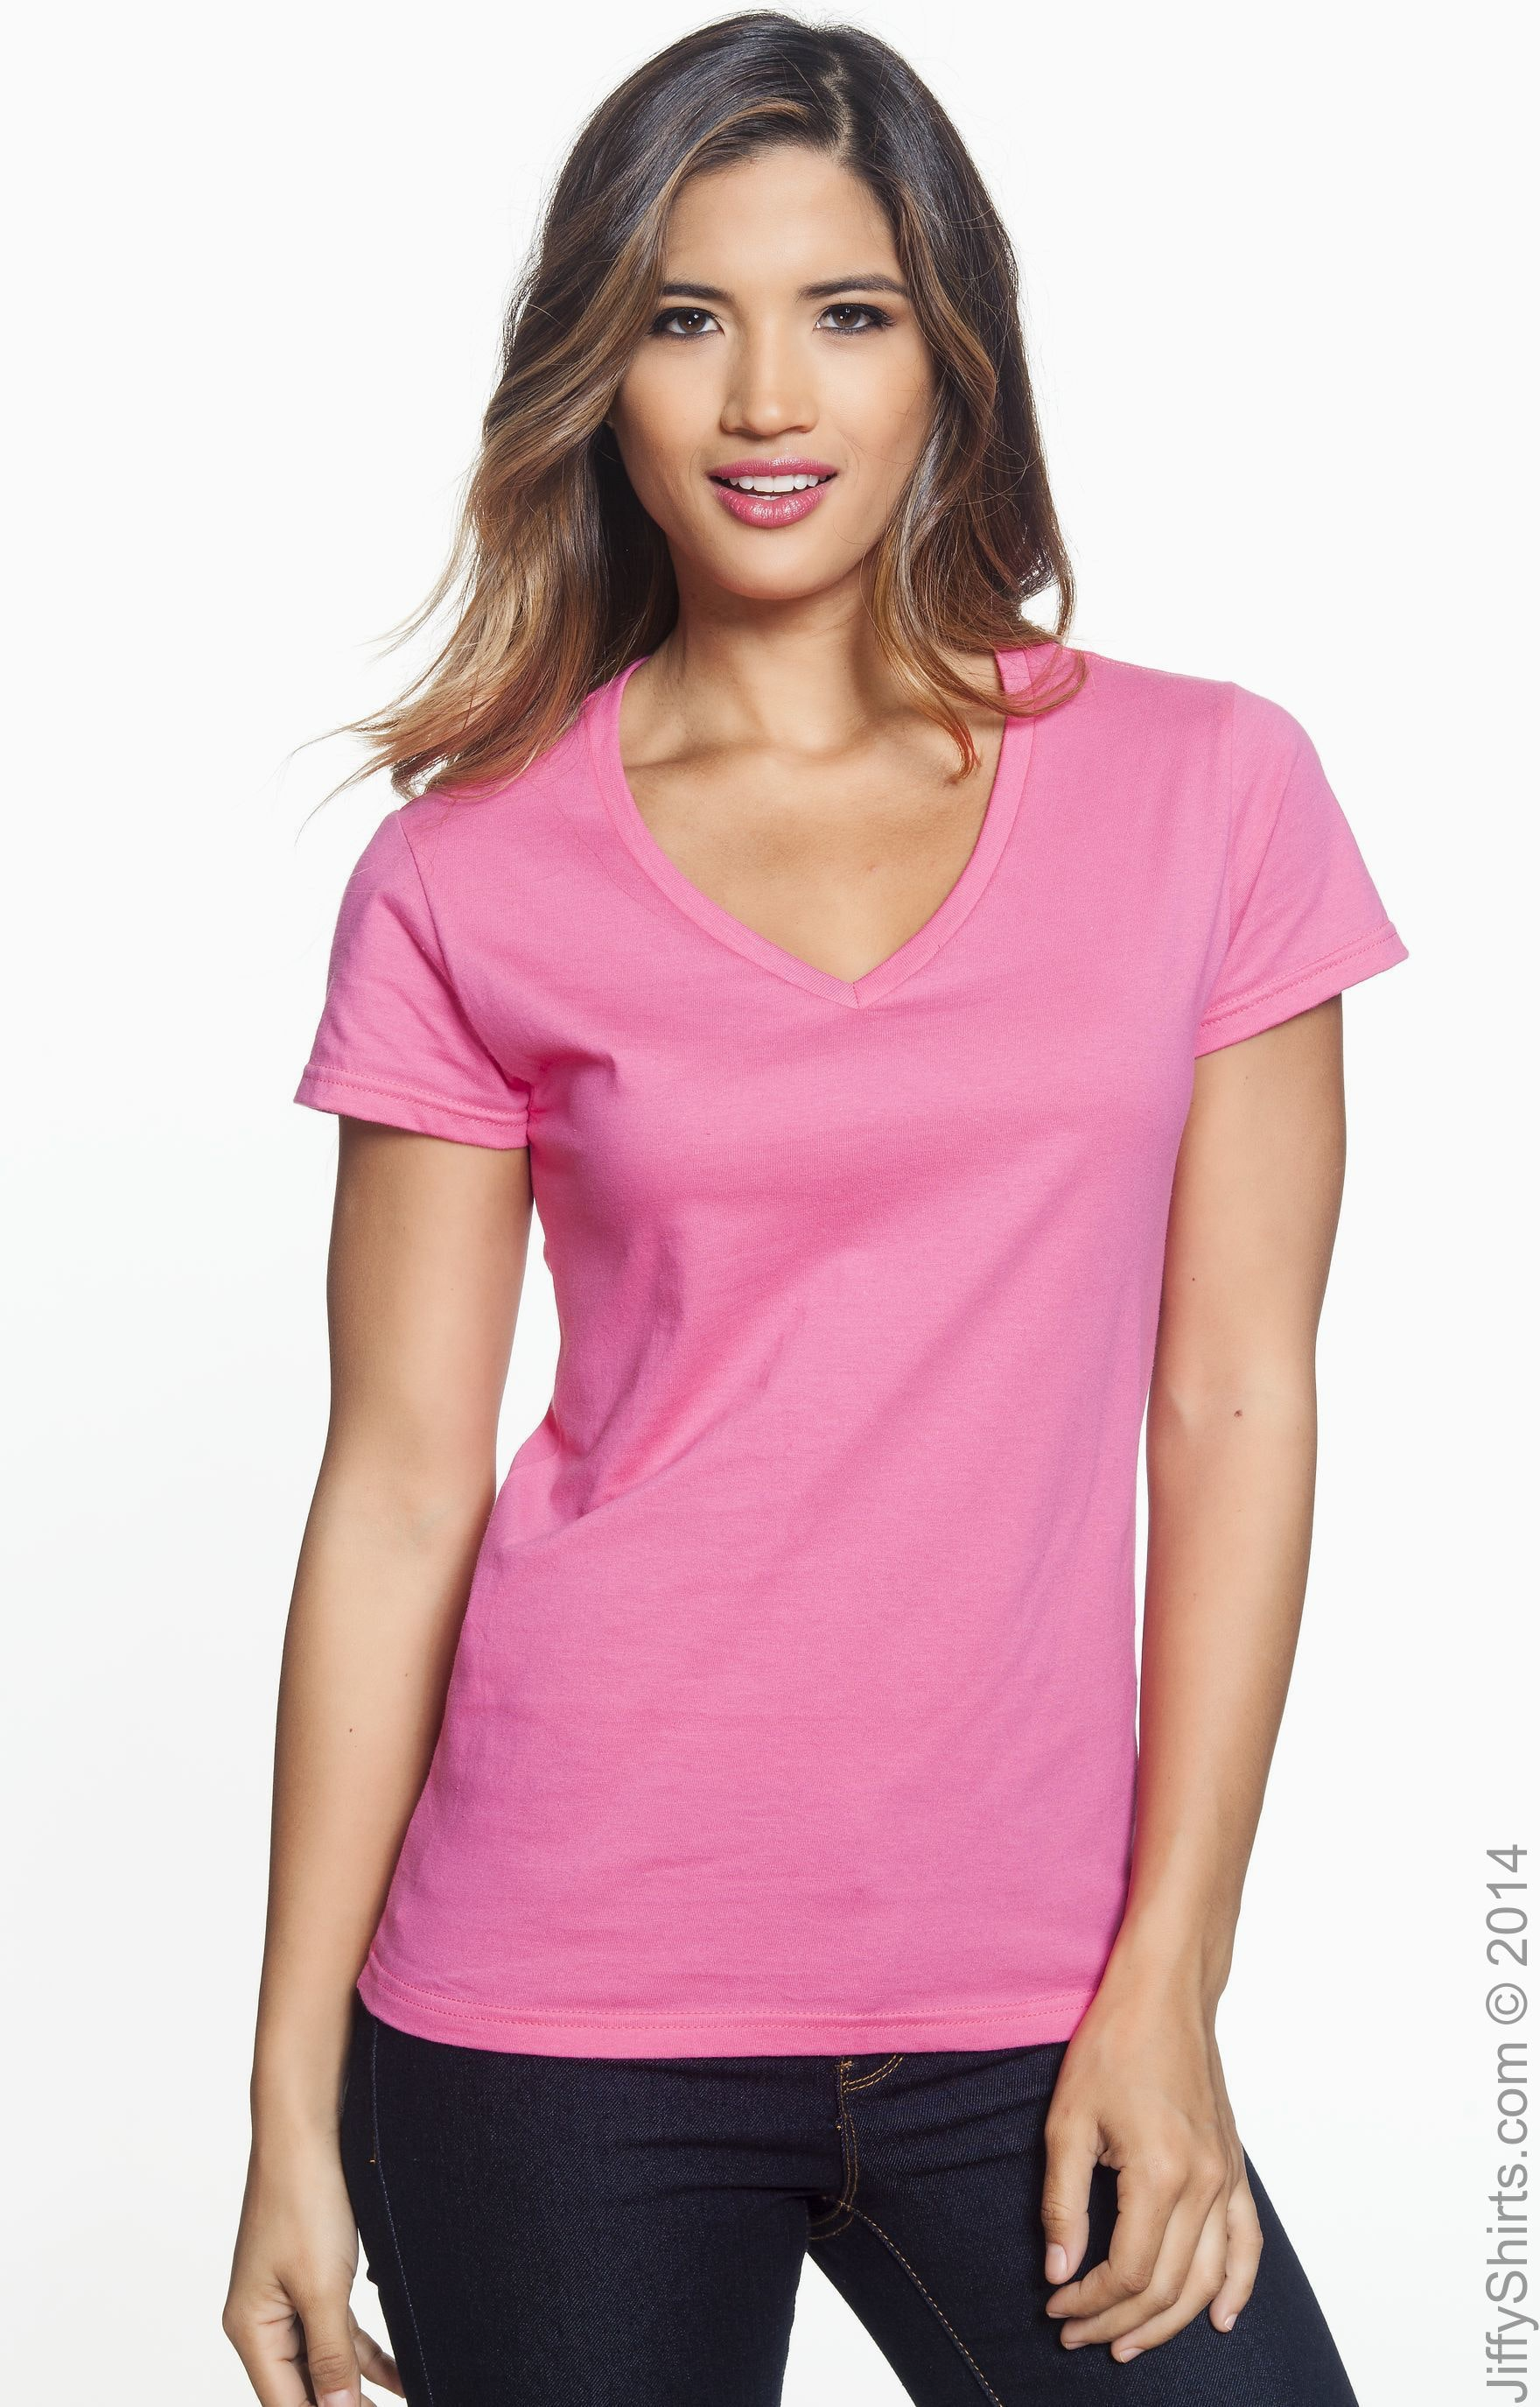 Anvil 88VL Hot Pink